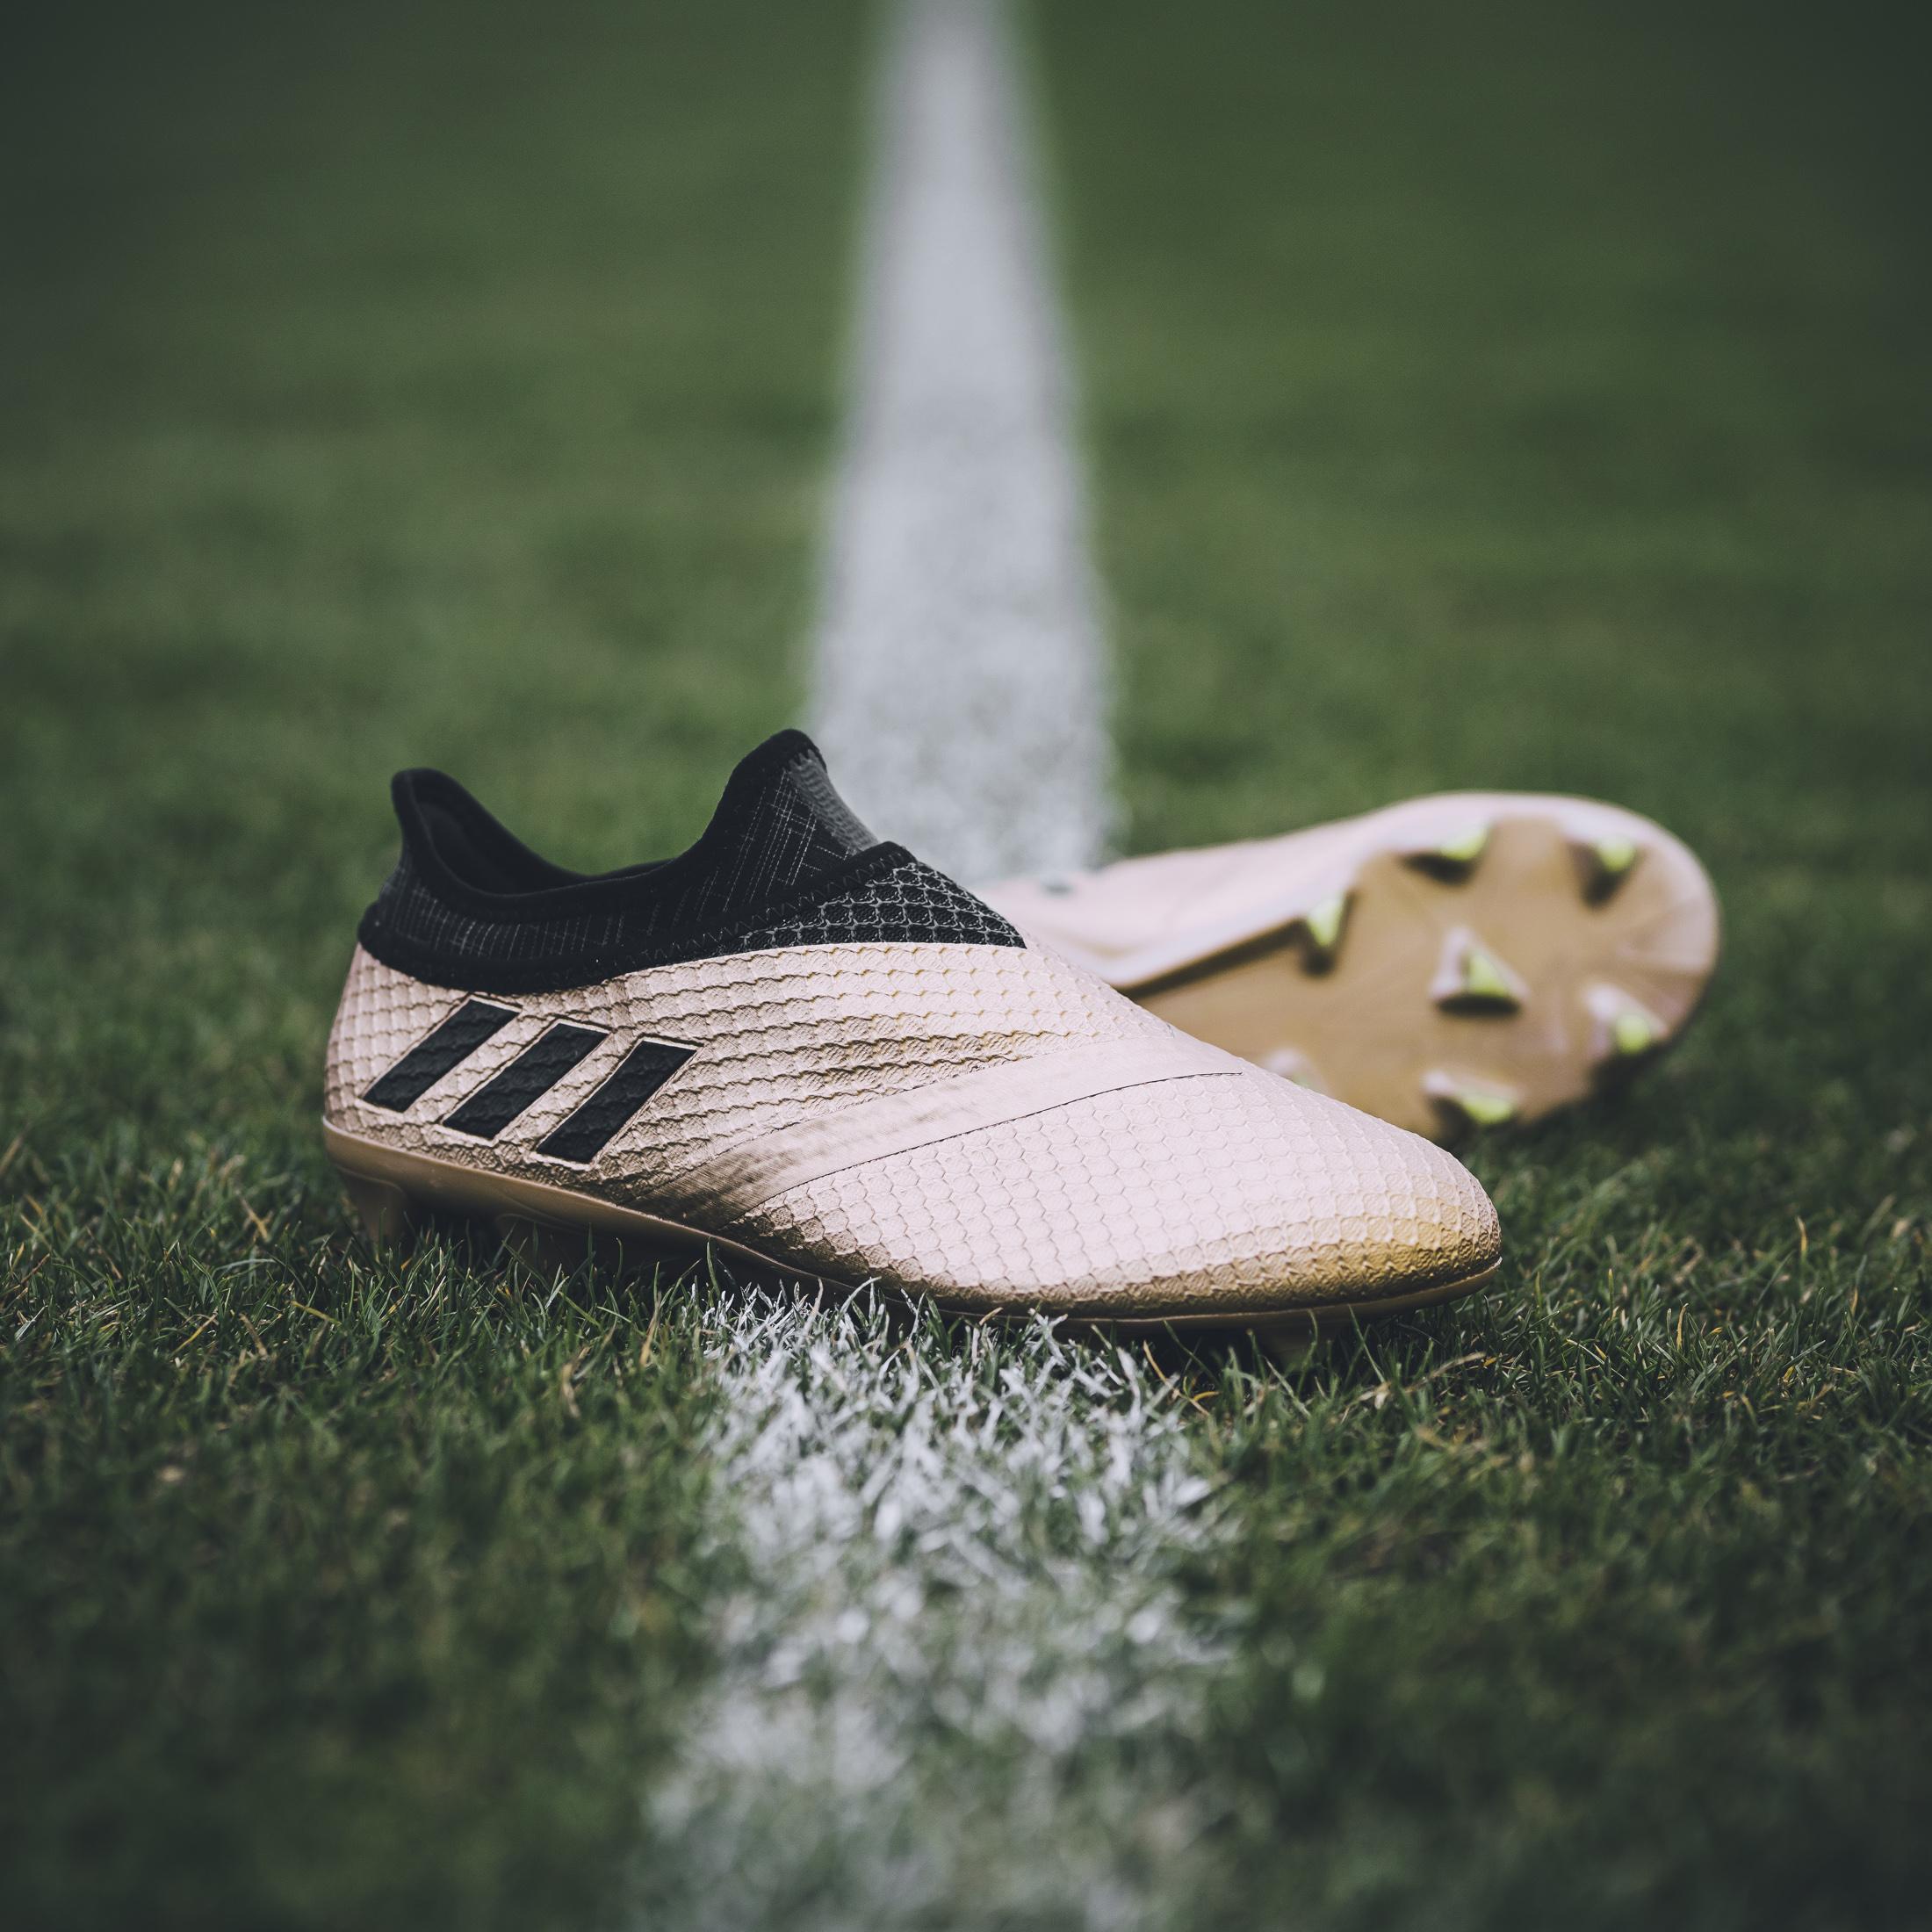 adidas_football_march_drop-02422.jpg